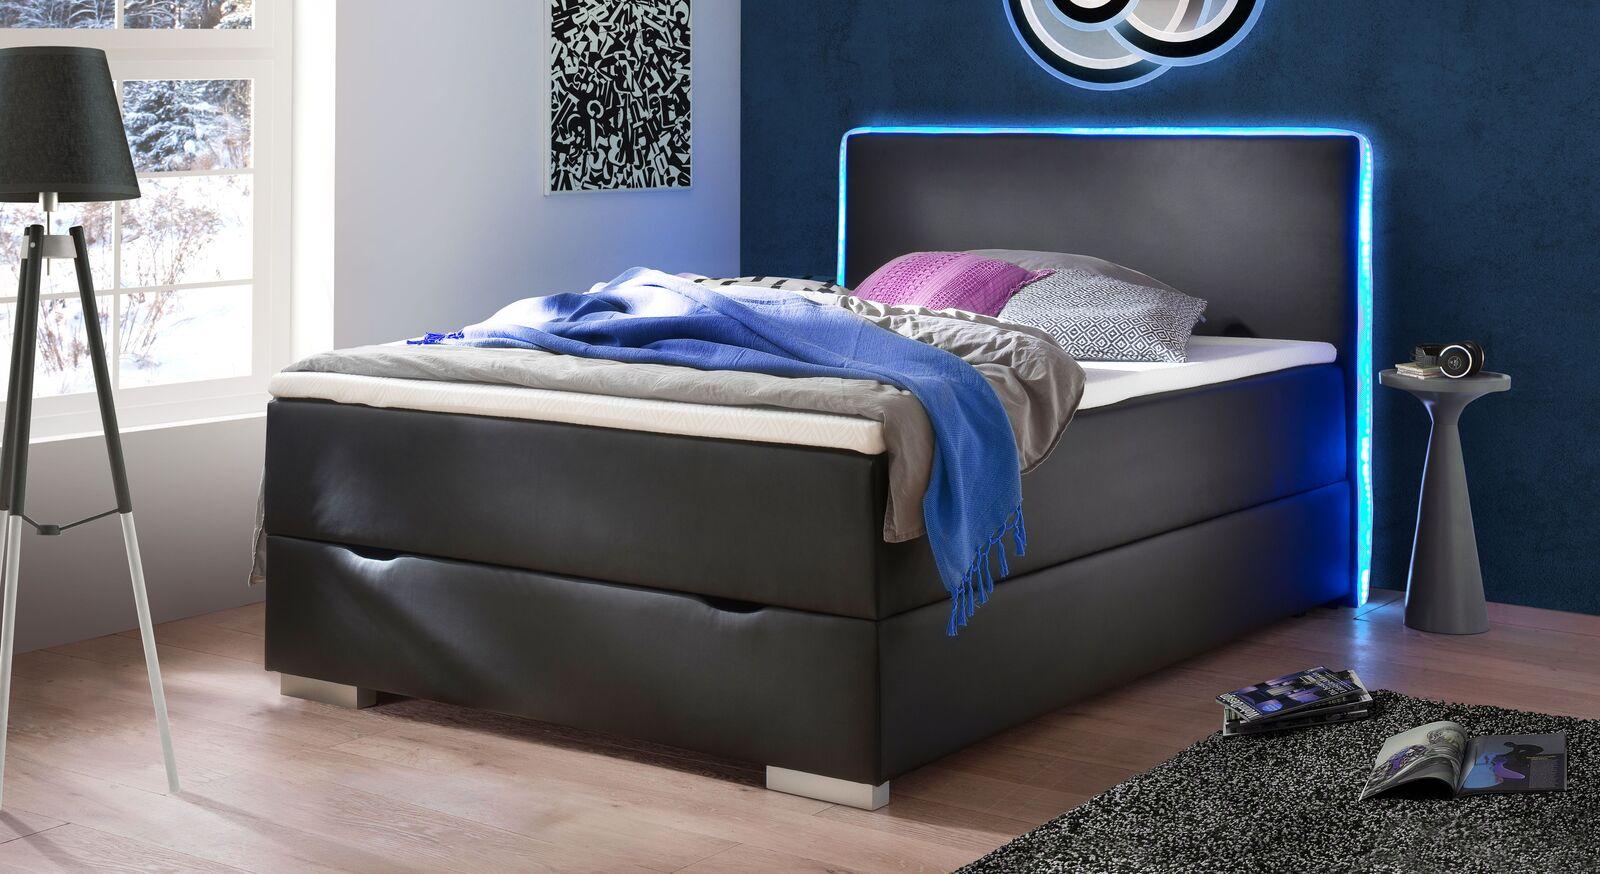 Bettkasten-Boxspringbett Merwin aus schwarzem Kunstleder